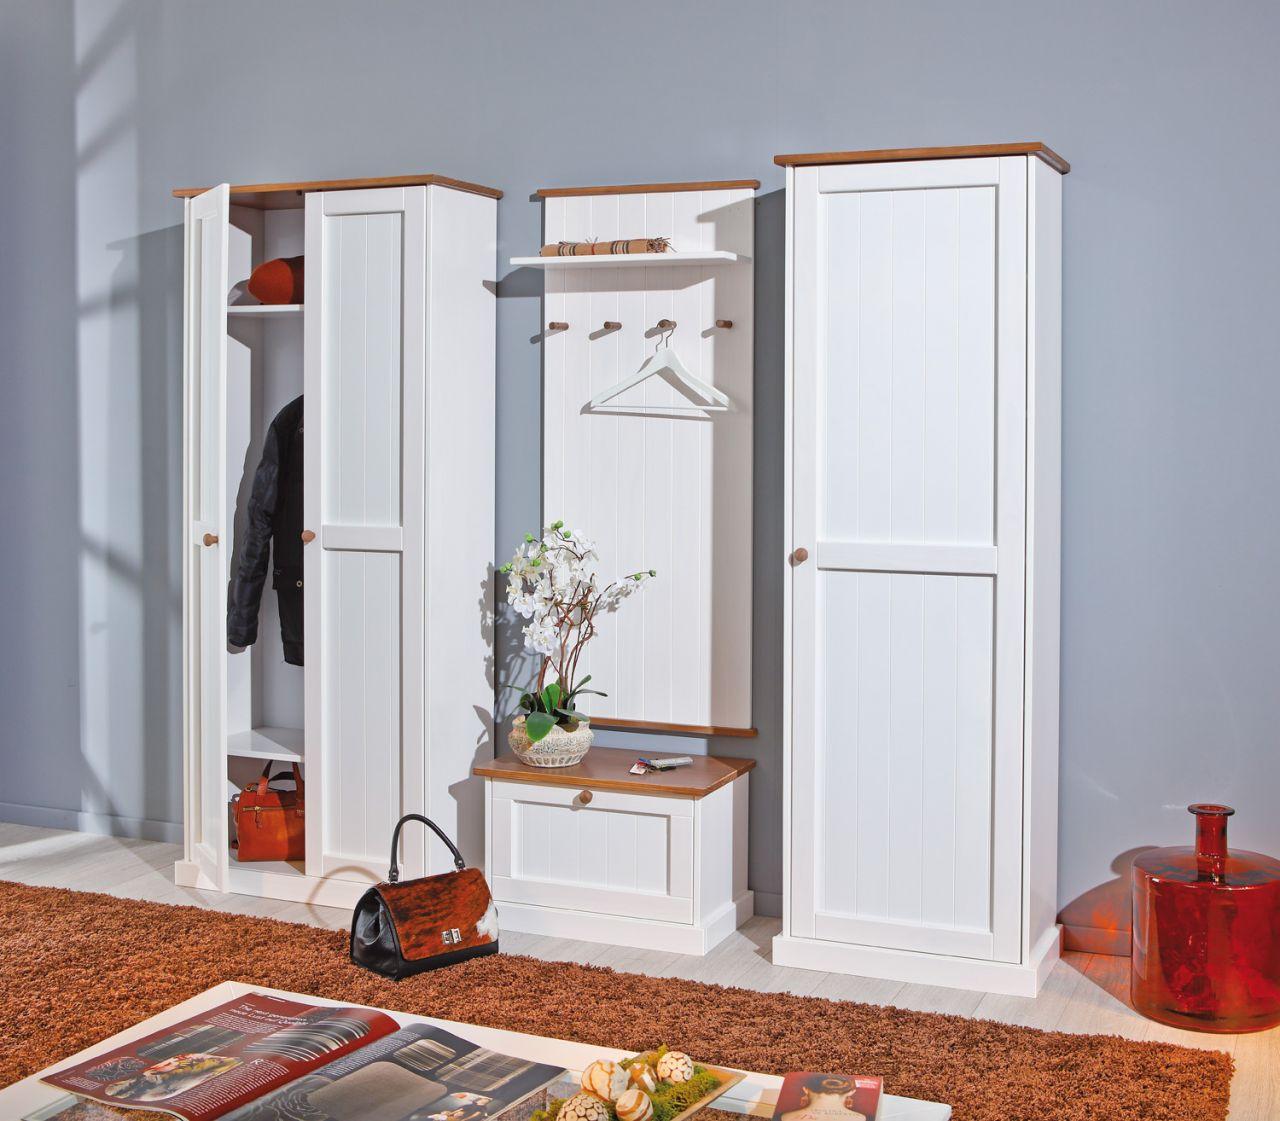 4-tlg. garderobe garderobenset landhausstil massivholz 2-farbig